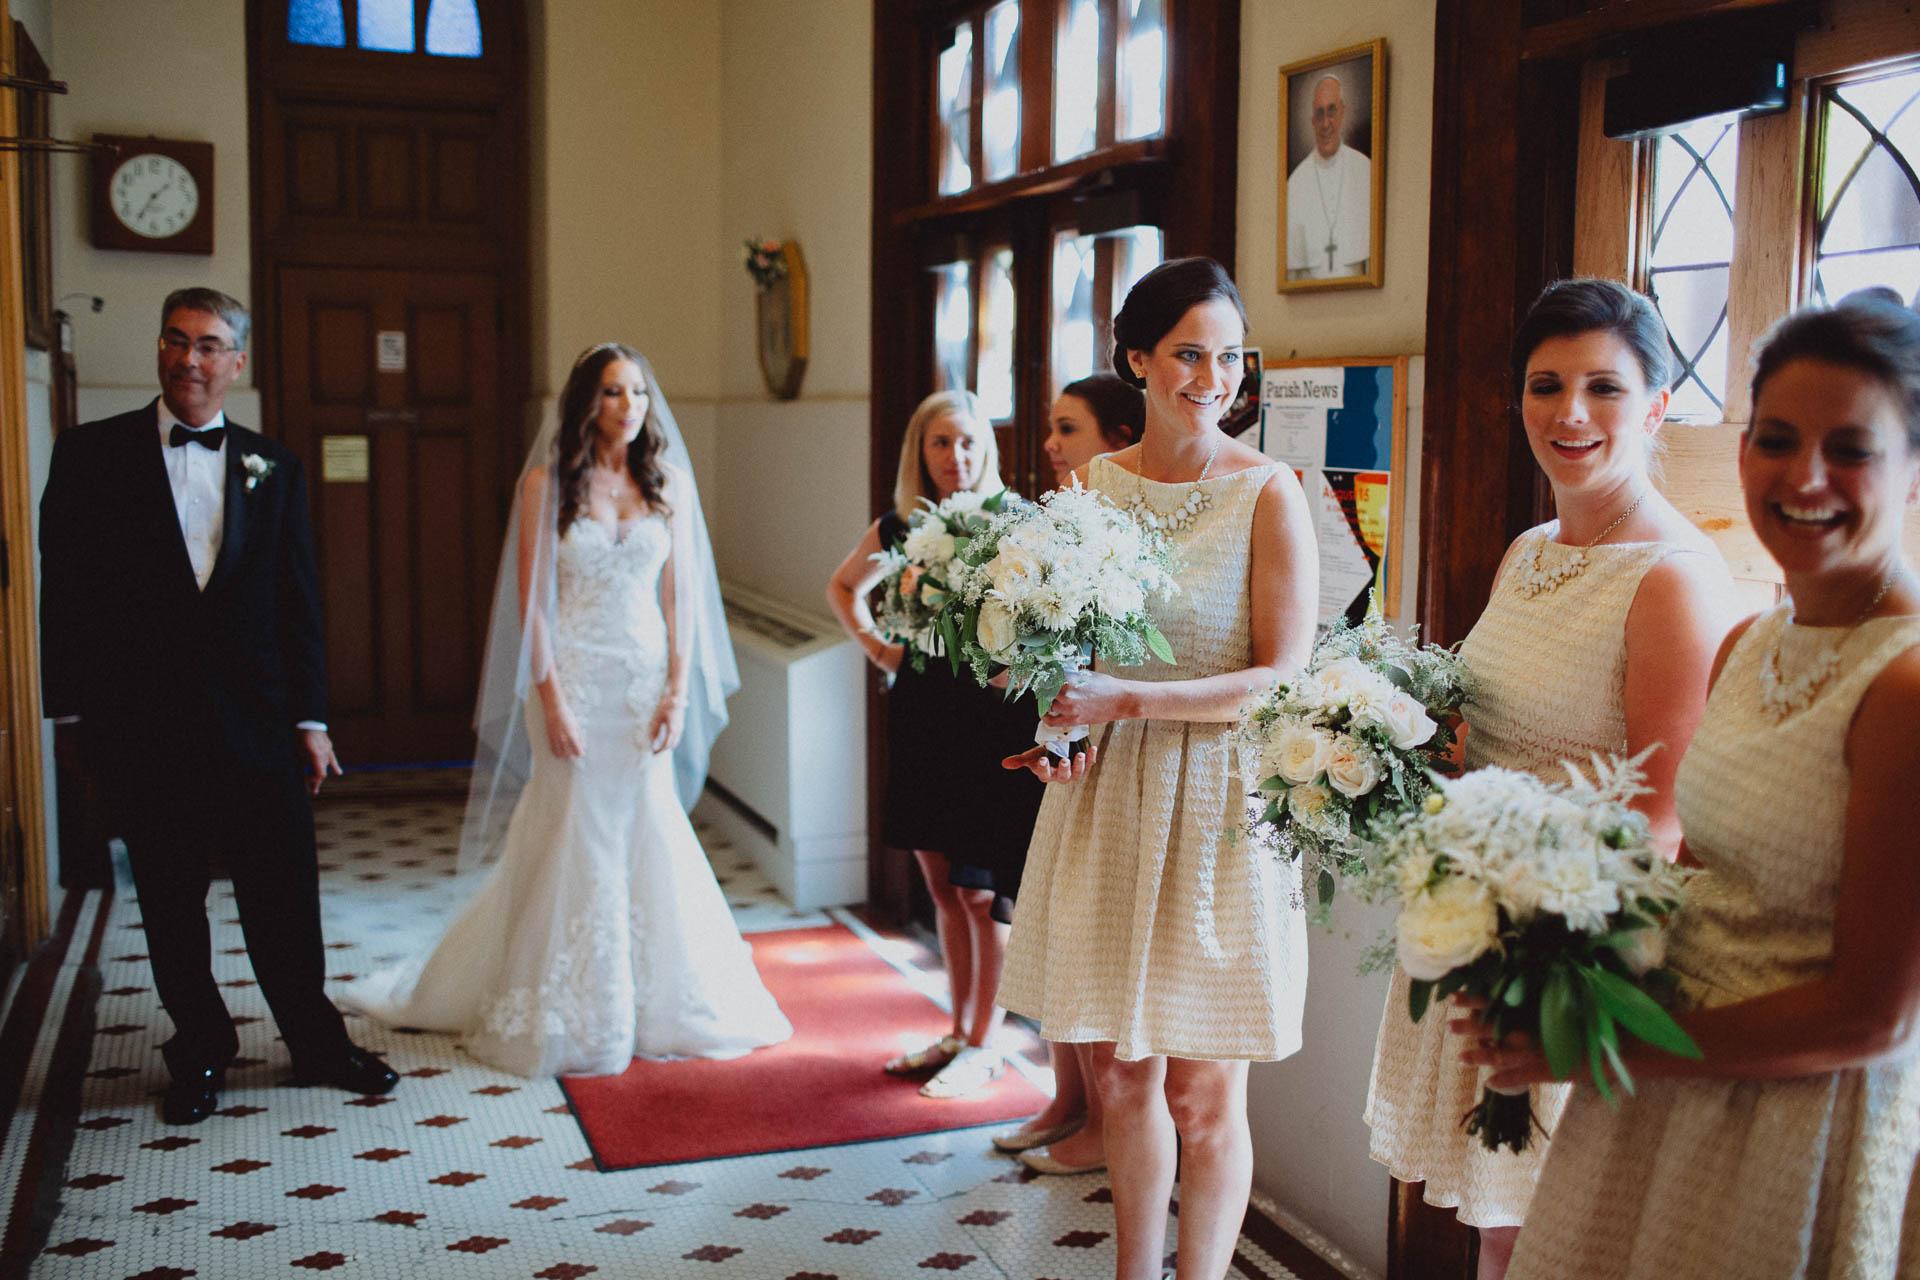 Keri-Joseph-Top-of-the-Market-Wedding-059@2x.jpg